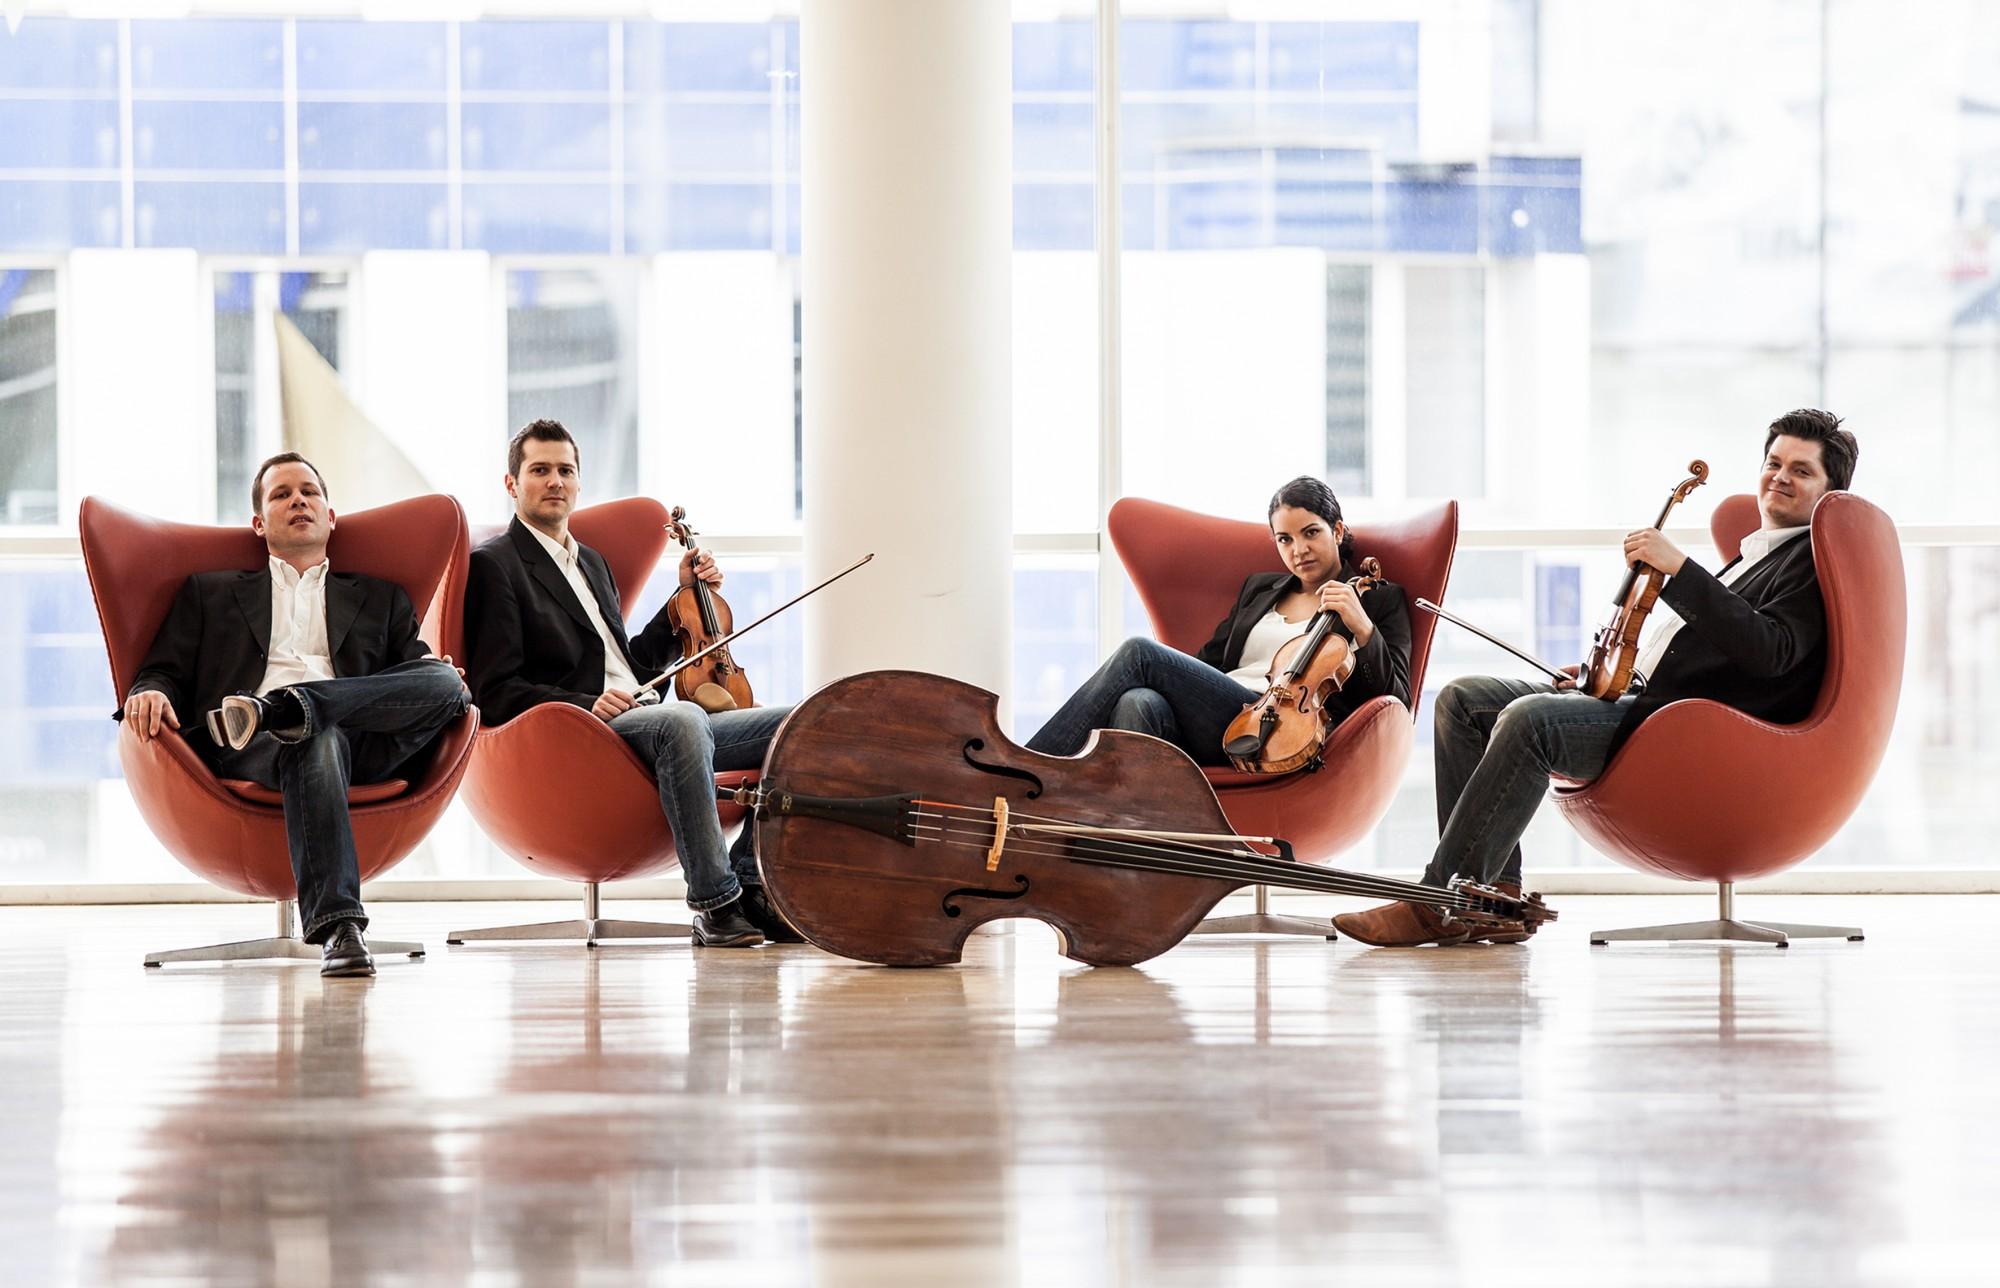 Mercator-Ensemble Mercatorhalle Streichquartett Kammermusik Fotoshooting Klassik Jazz Walzer Tangos